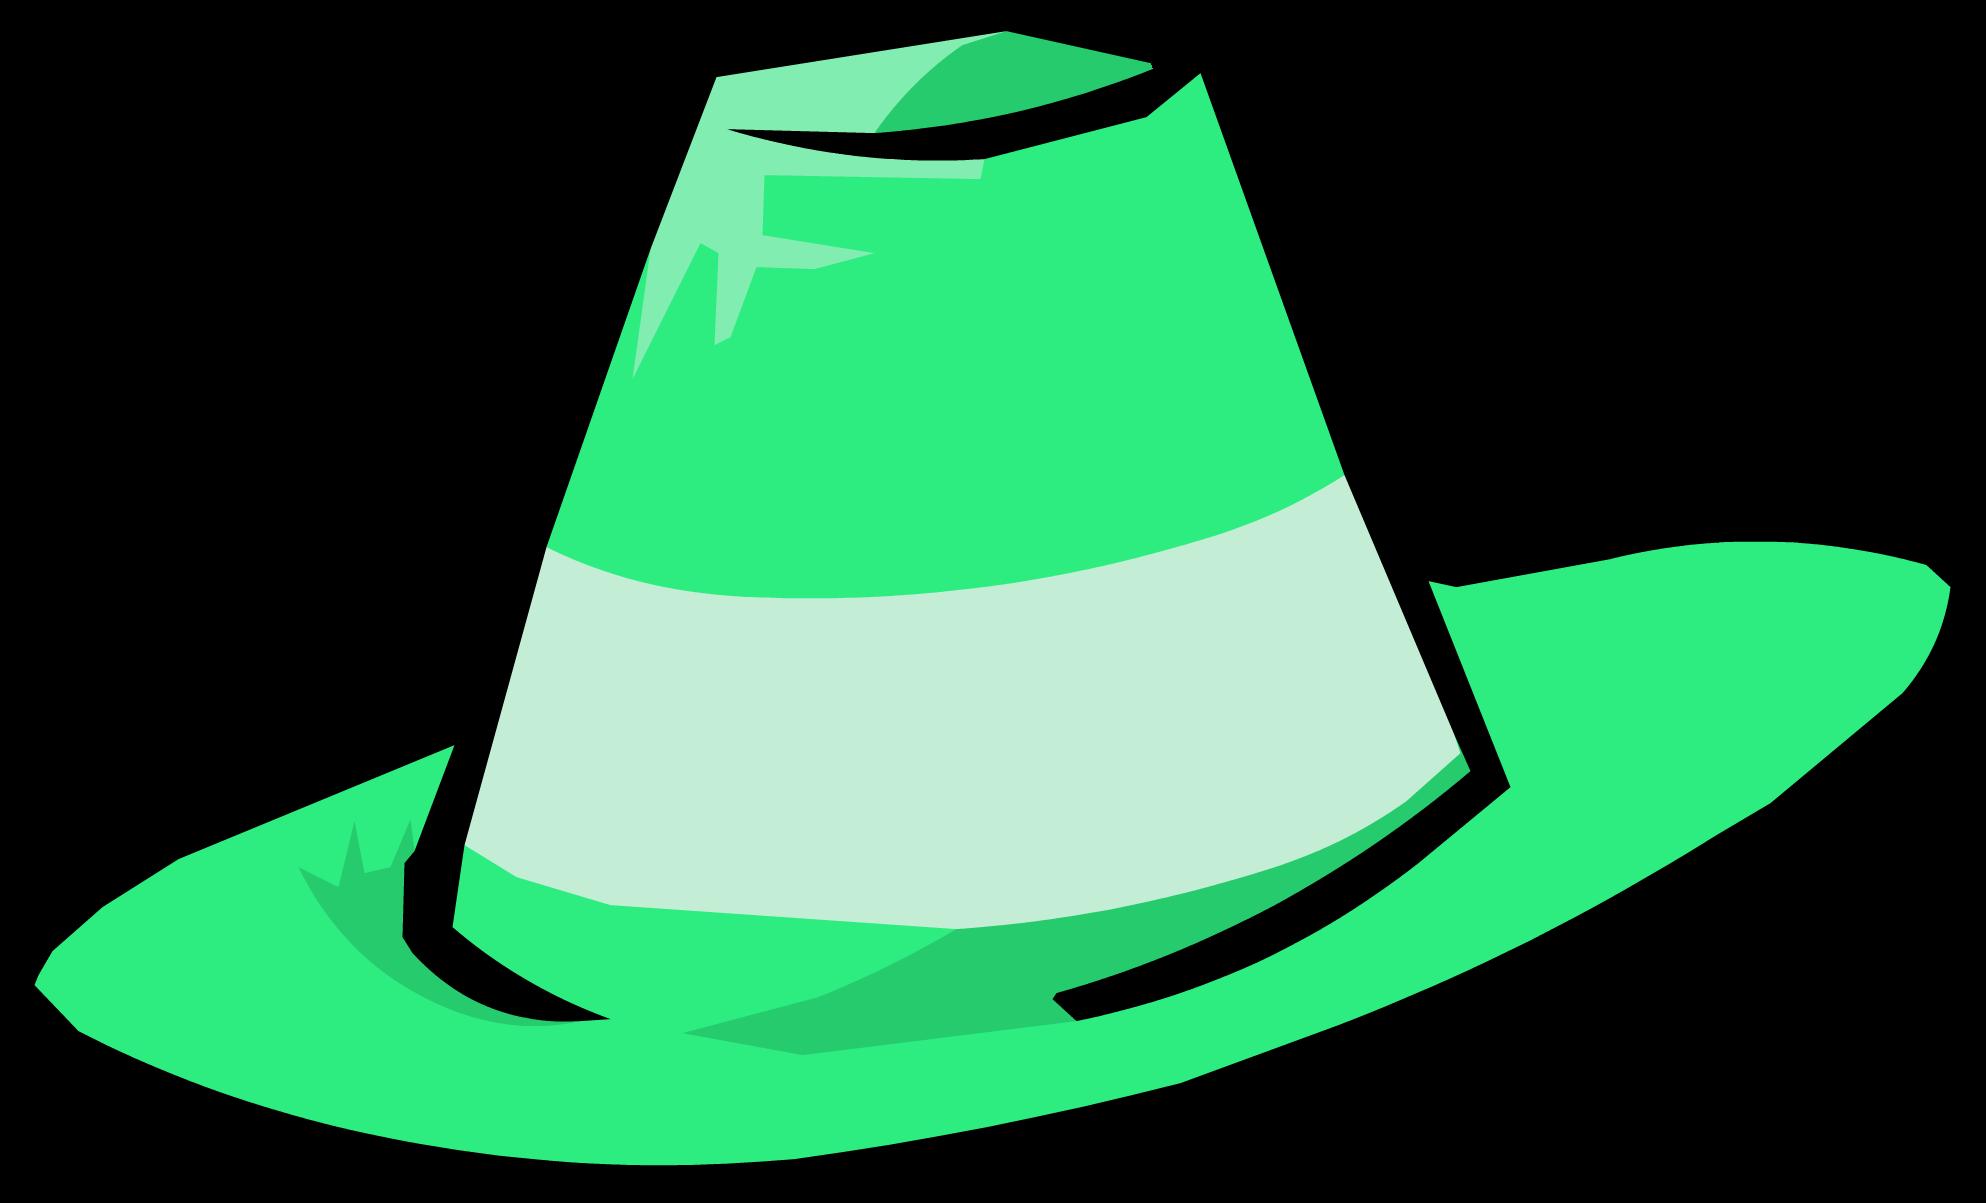 Green Fedora